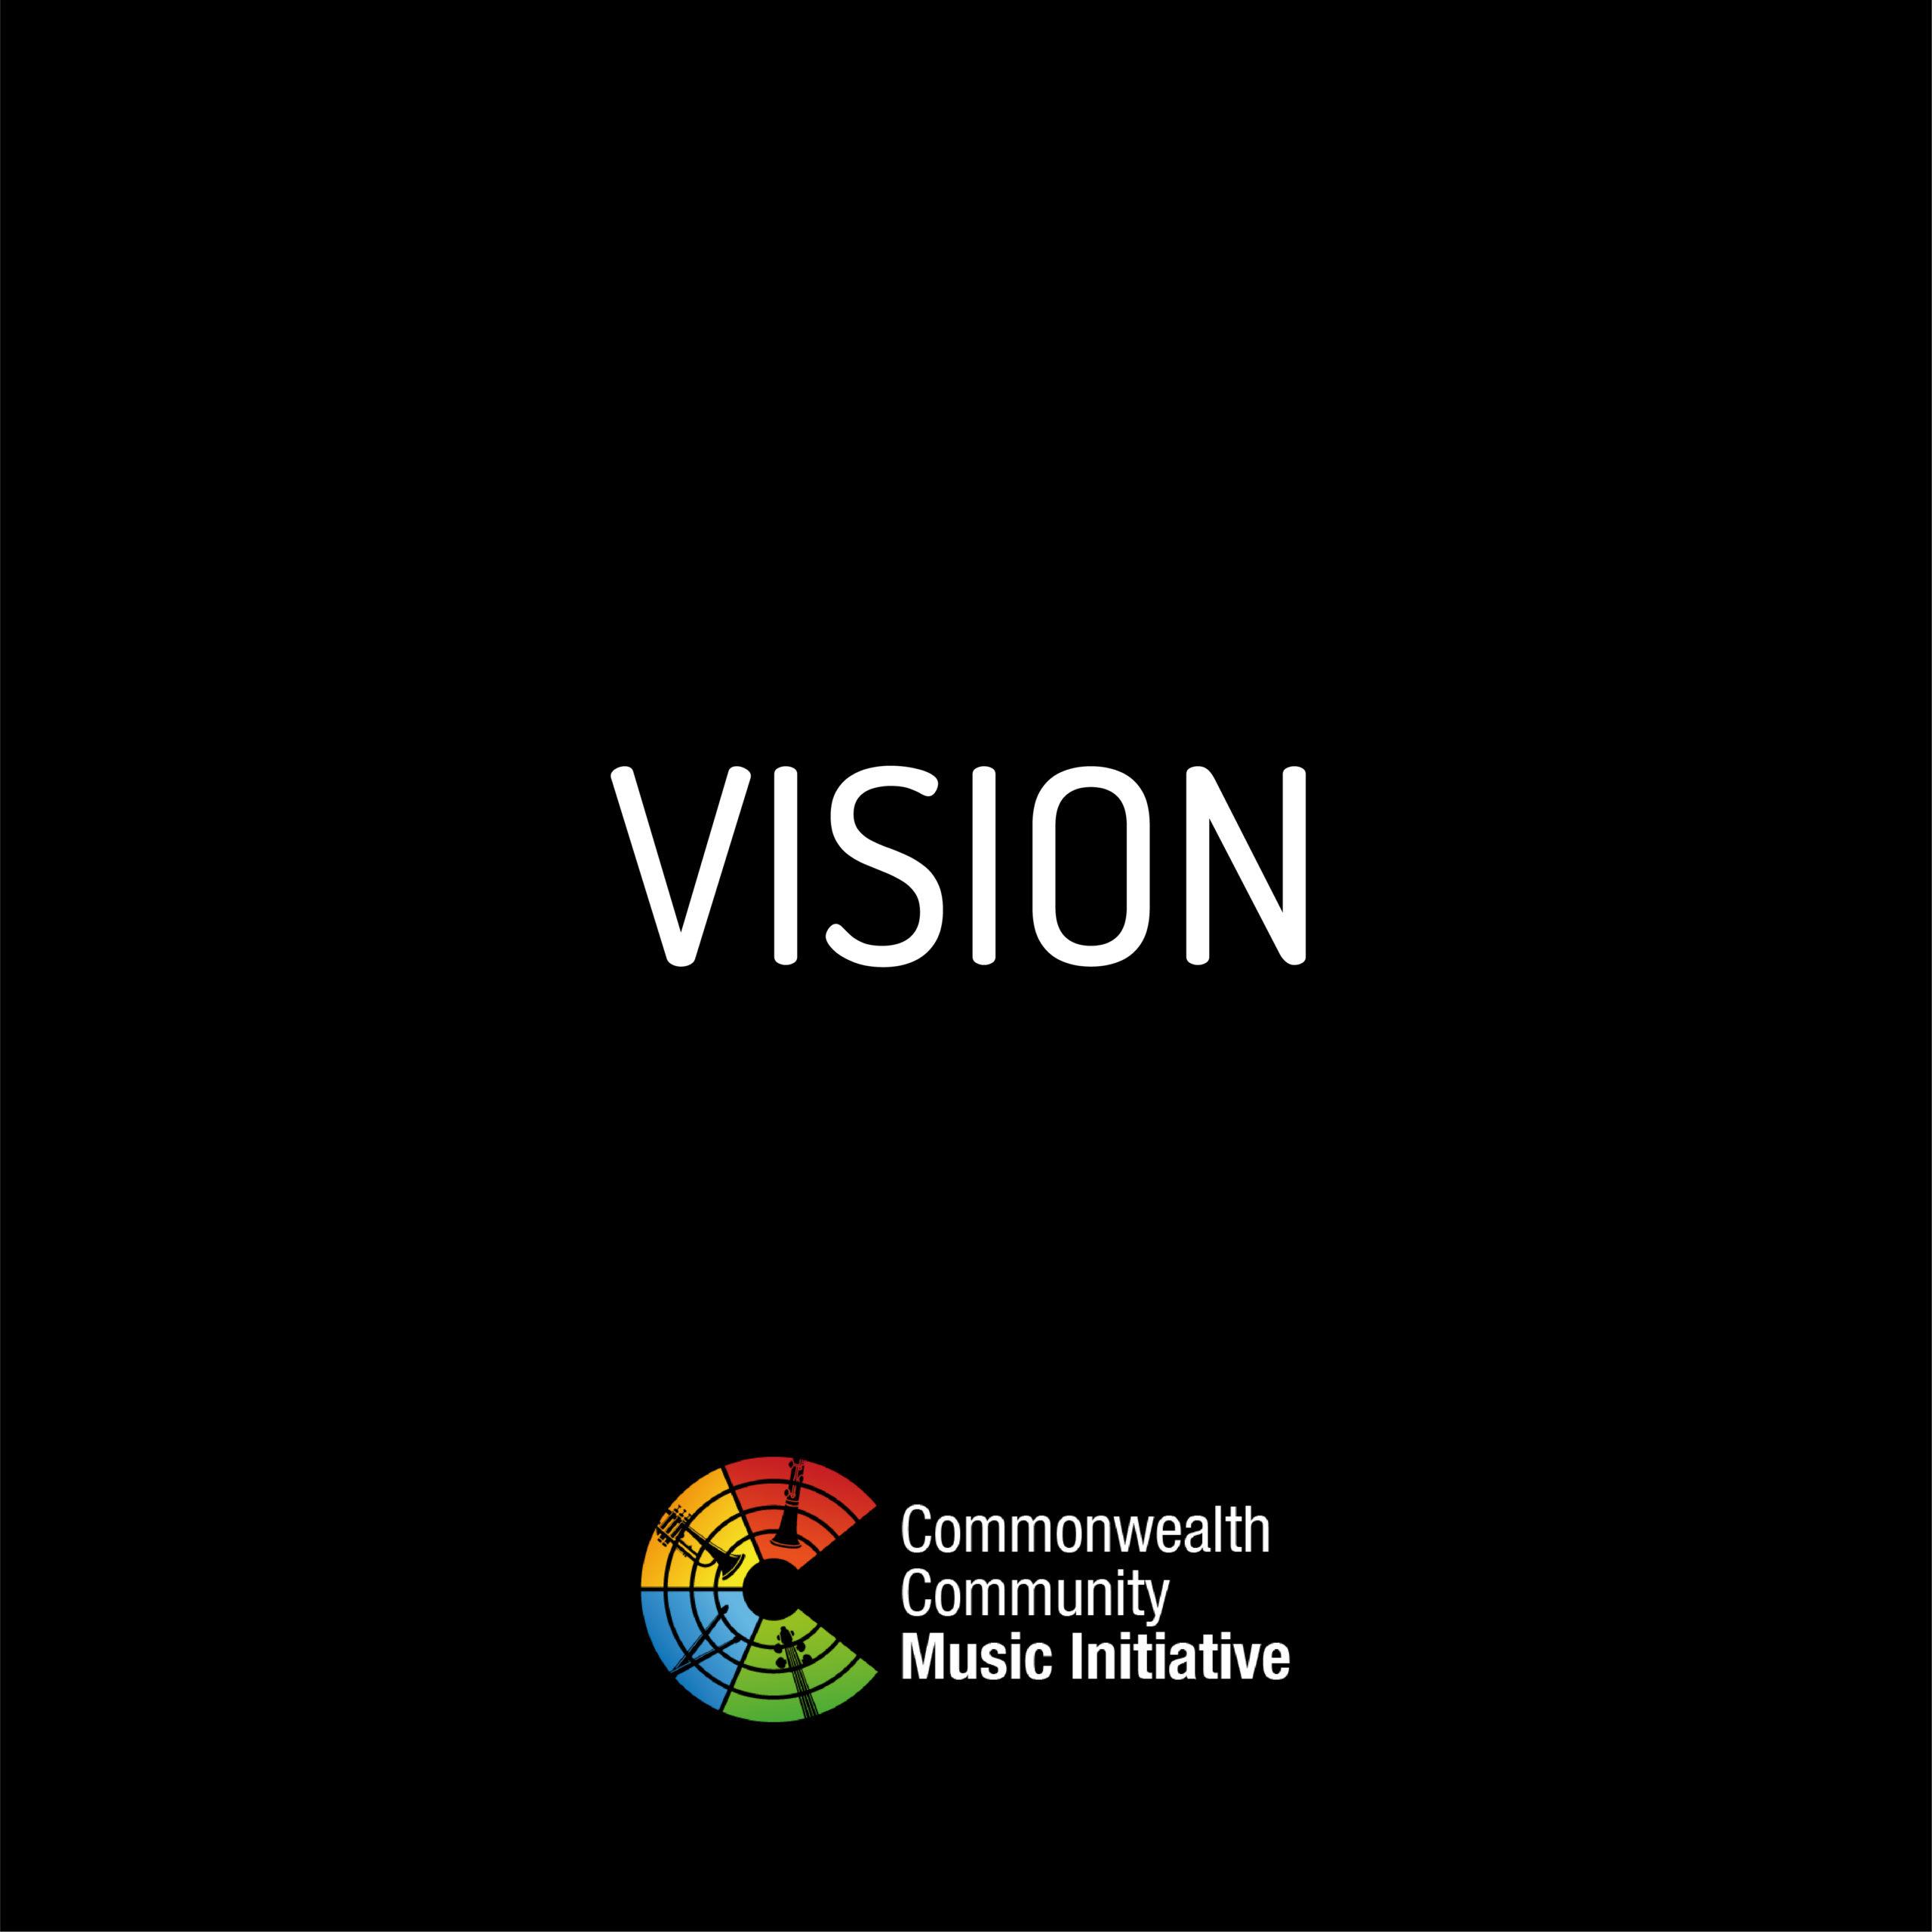 Commonwealth Community Music Initiative | Vision